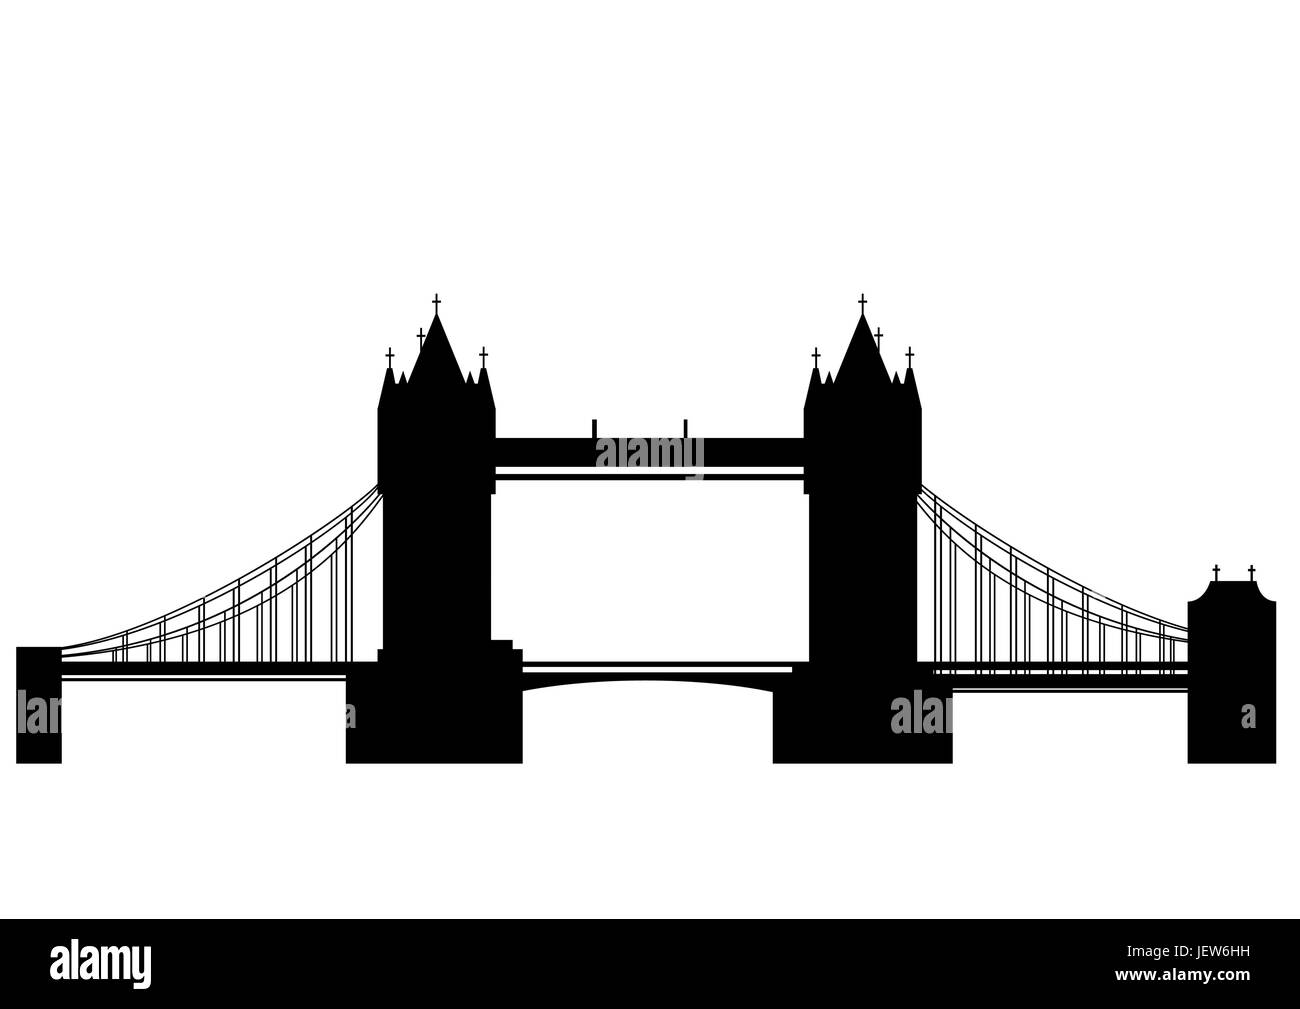 turm br cke london umri zeichen vektor piktogramm symbol piktogramm vektor abbildung. Black Bedroom Furniture Sets. Home Design Ideas